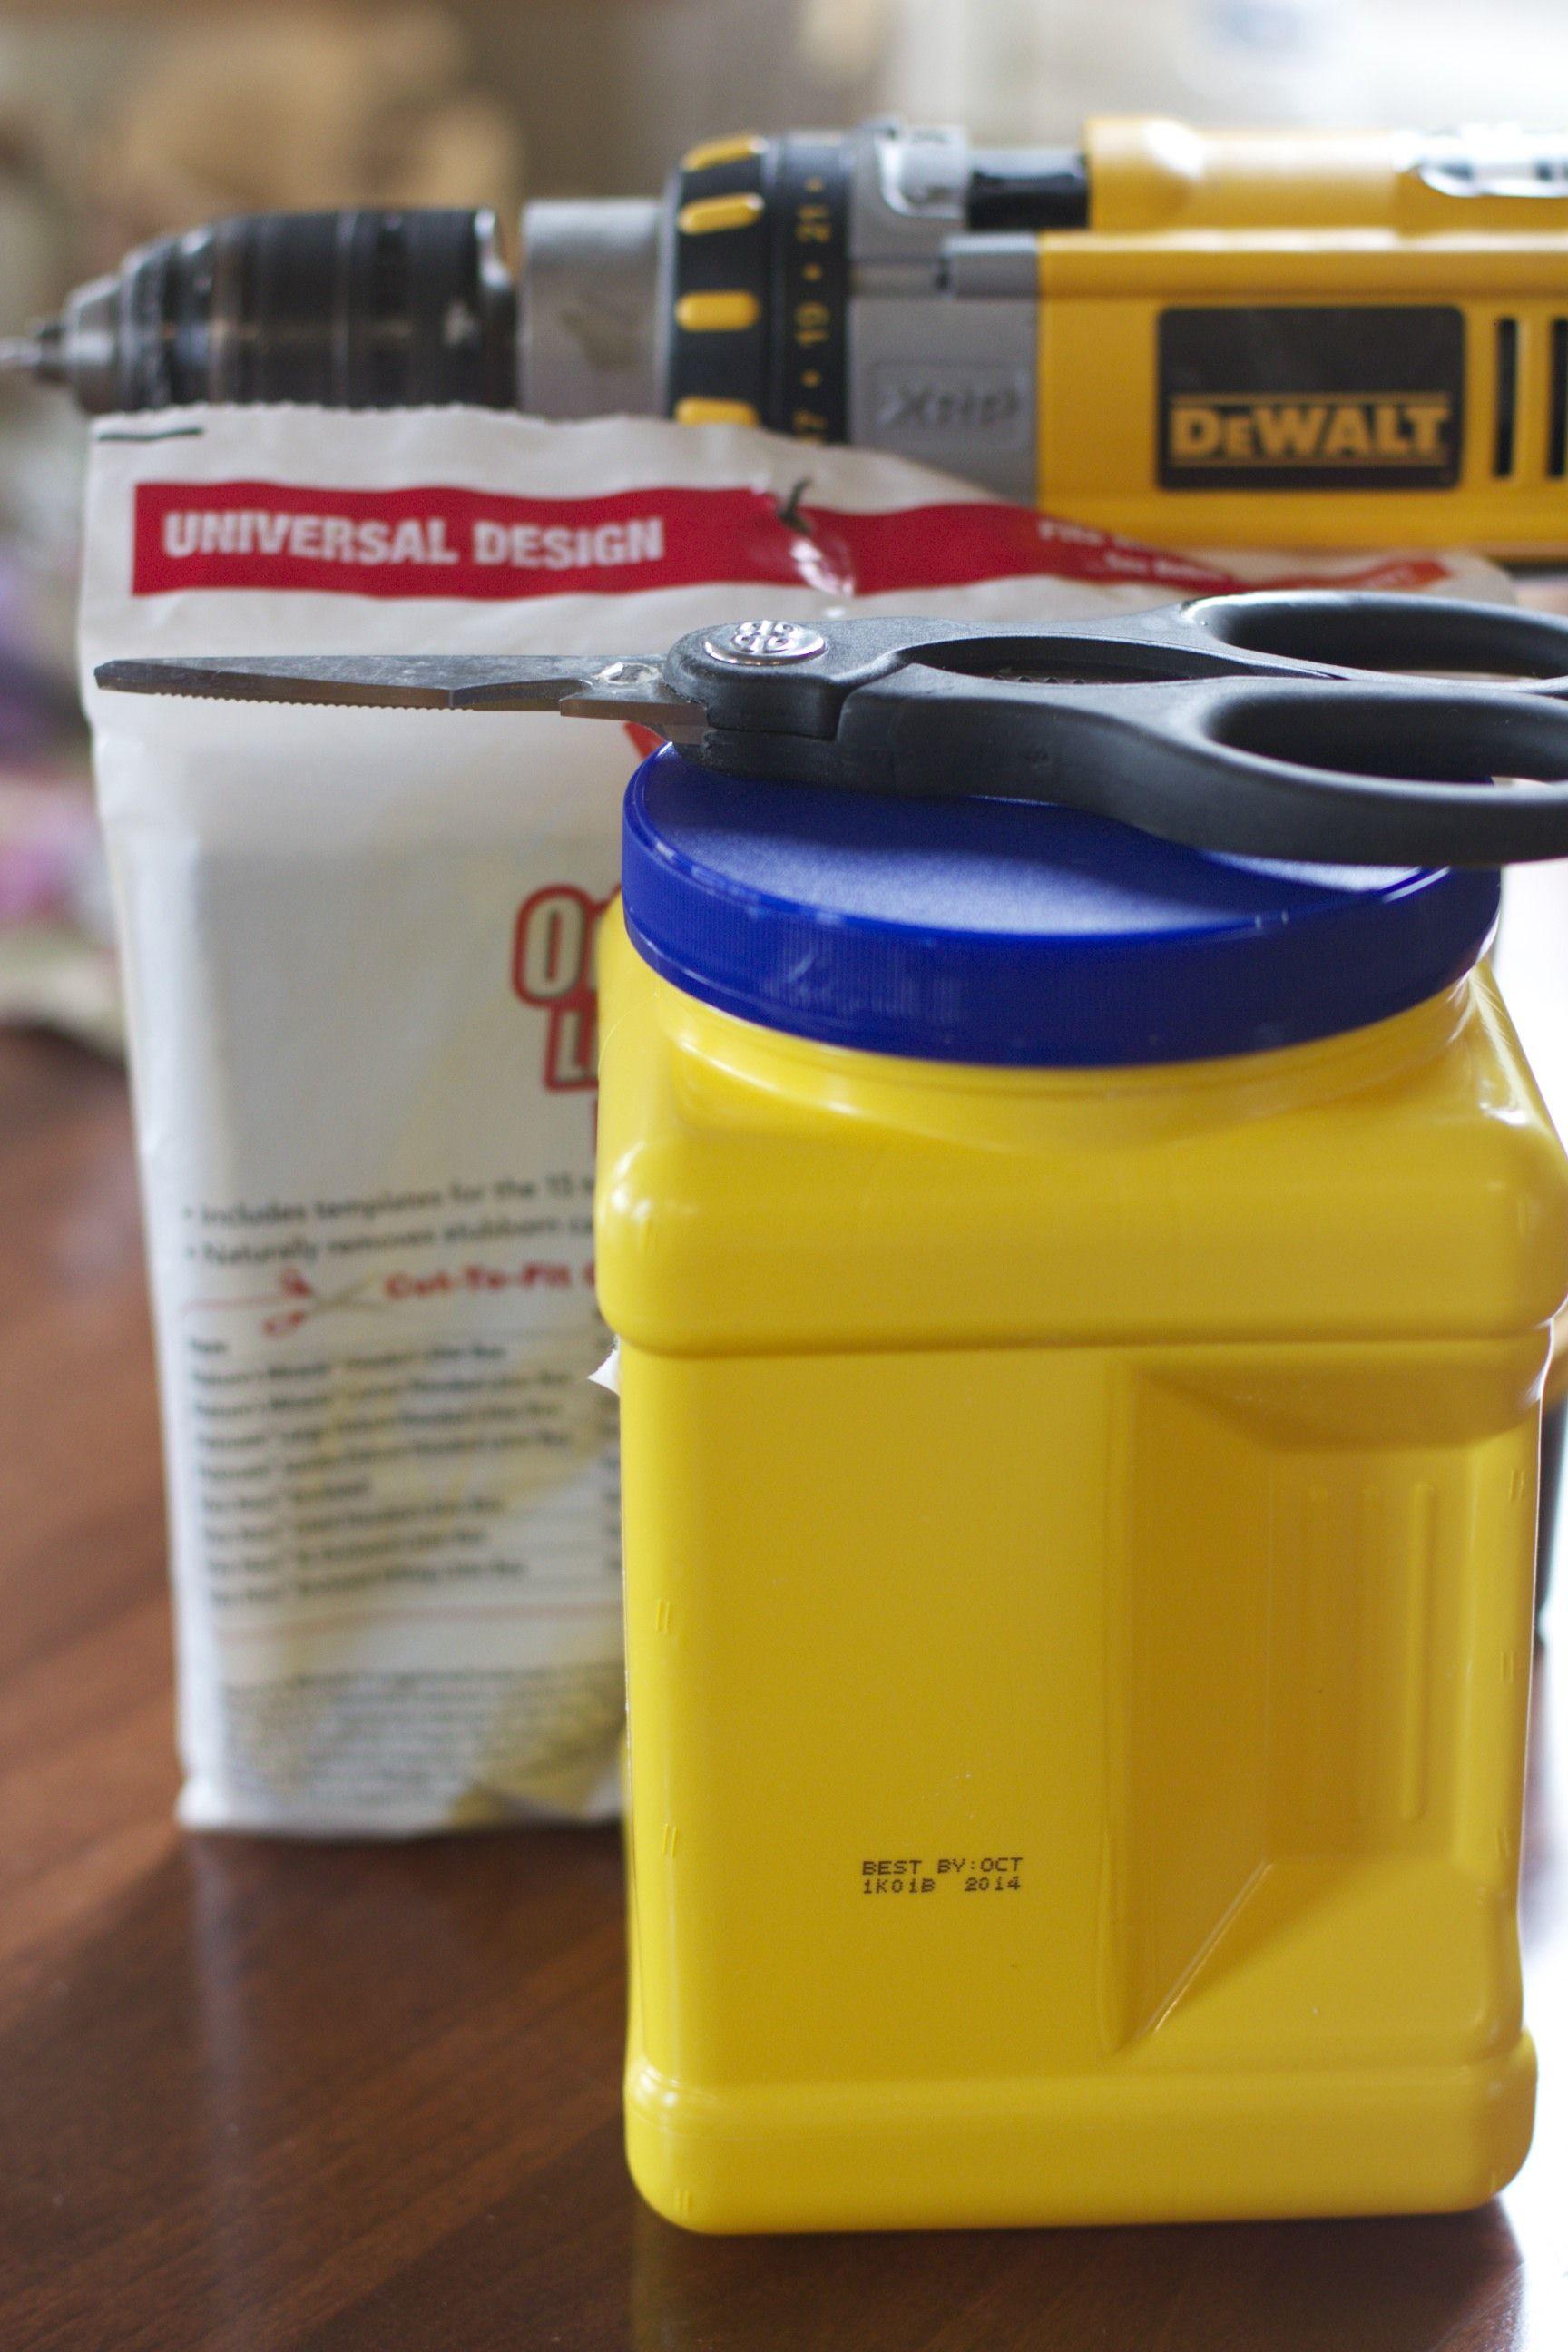 DIY Kitchen Compost Pail (With images) | Compost pail ...